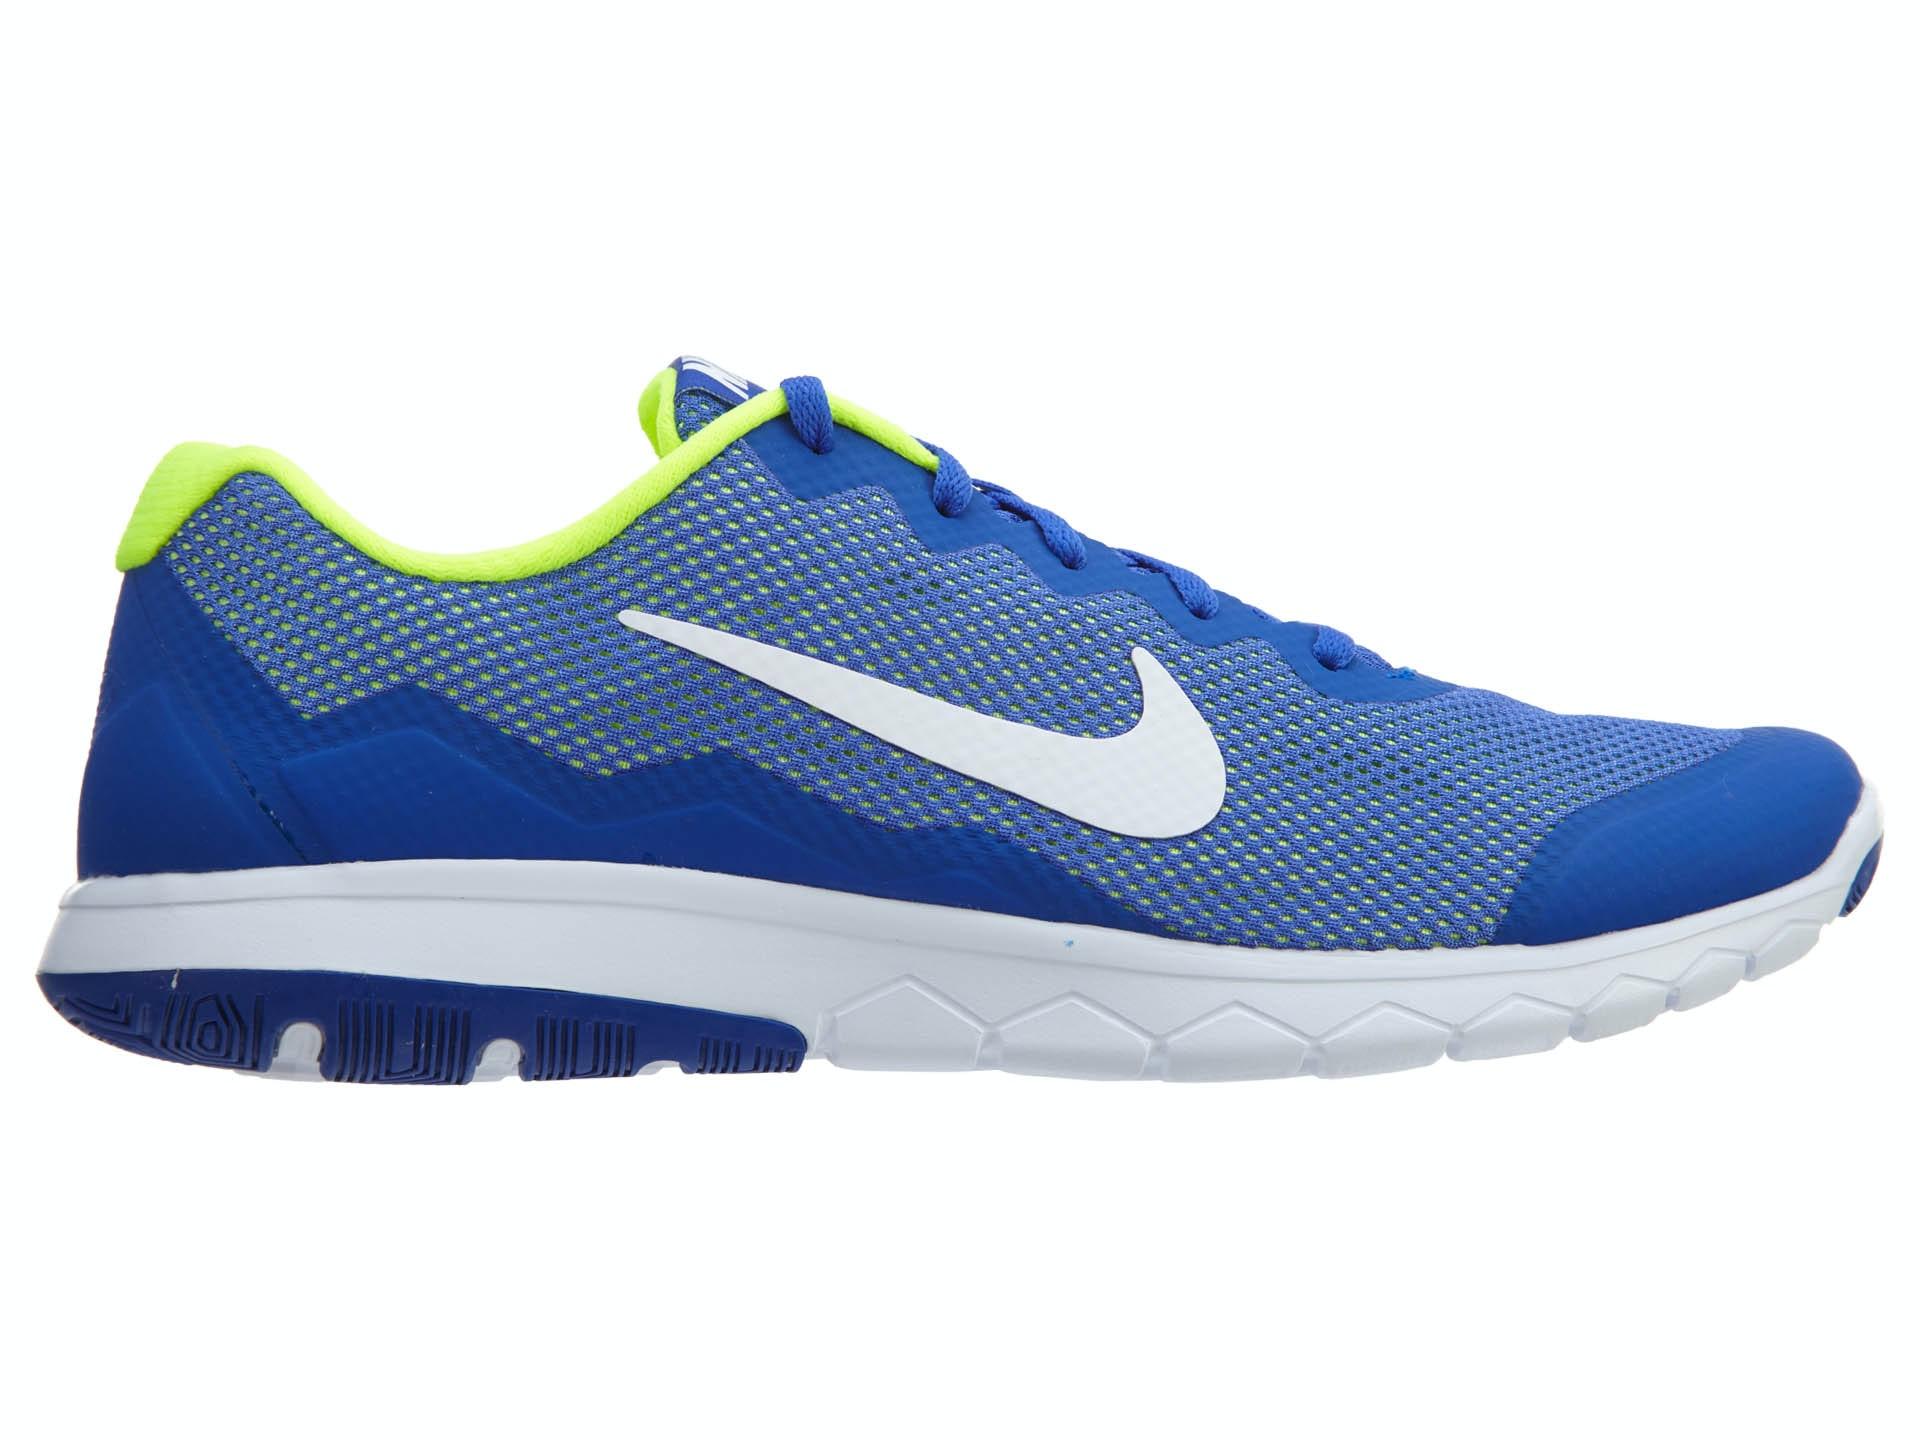 b7f456dcbb8 Jordan Air Shoes In Qatar Nike Shops In Qatar